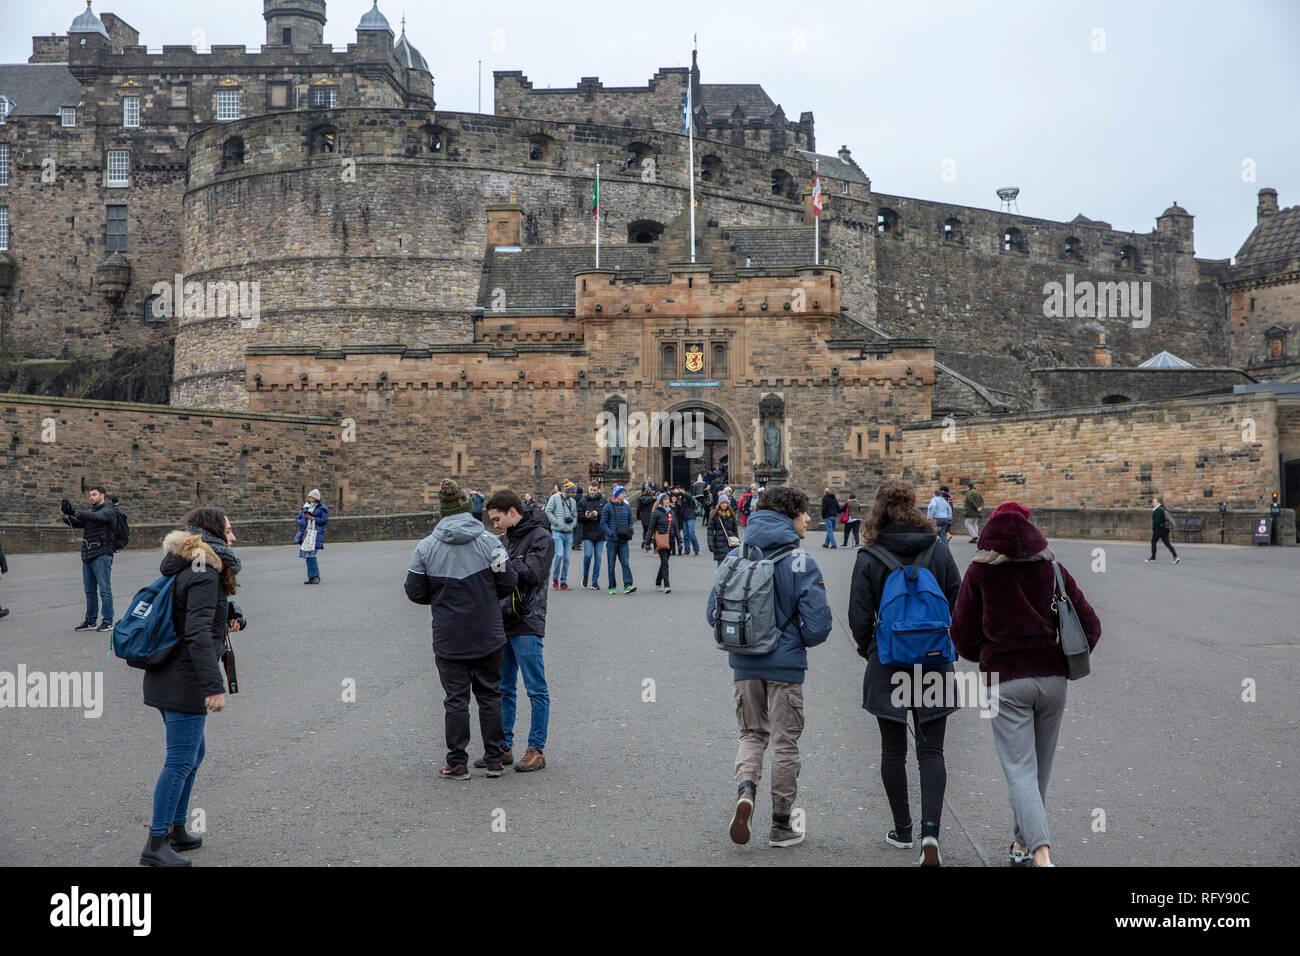 Edinburgh castle in the city of Edinburgh Scotland on a winters day - Stock Image